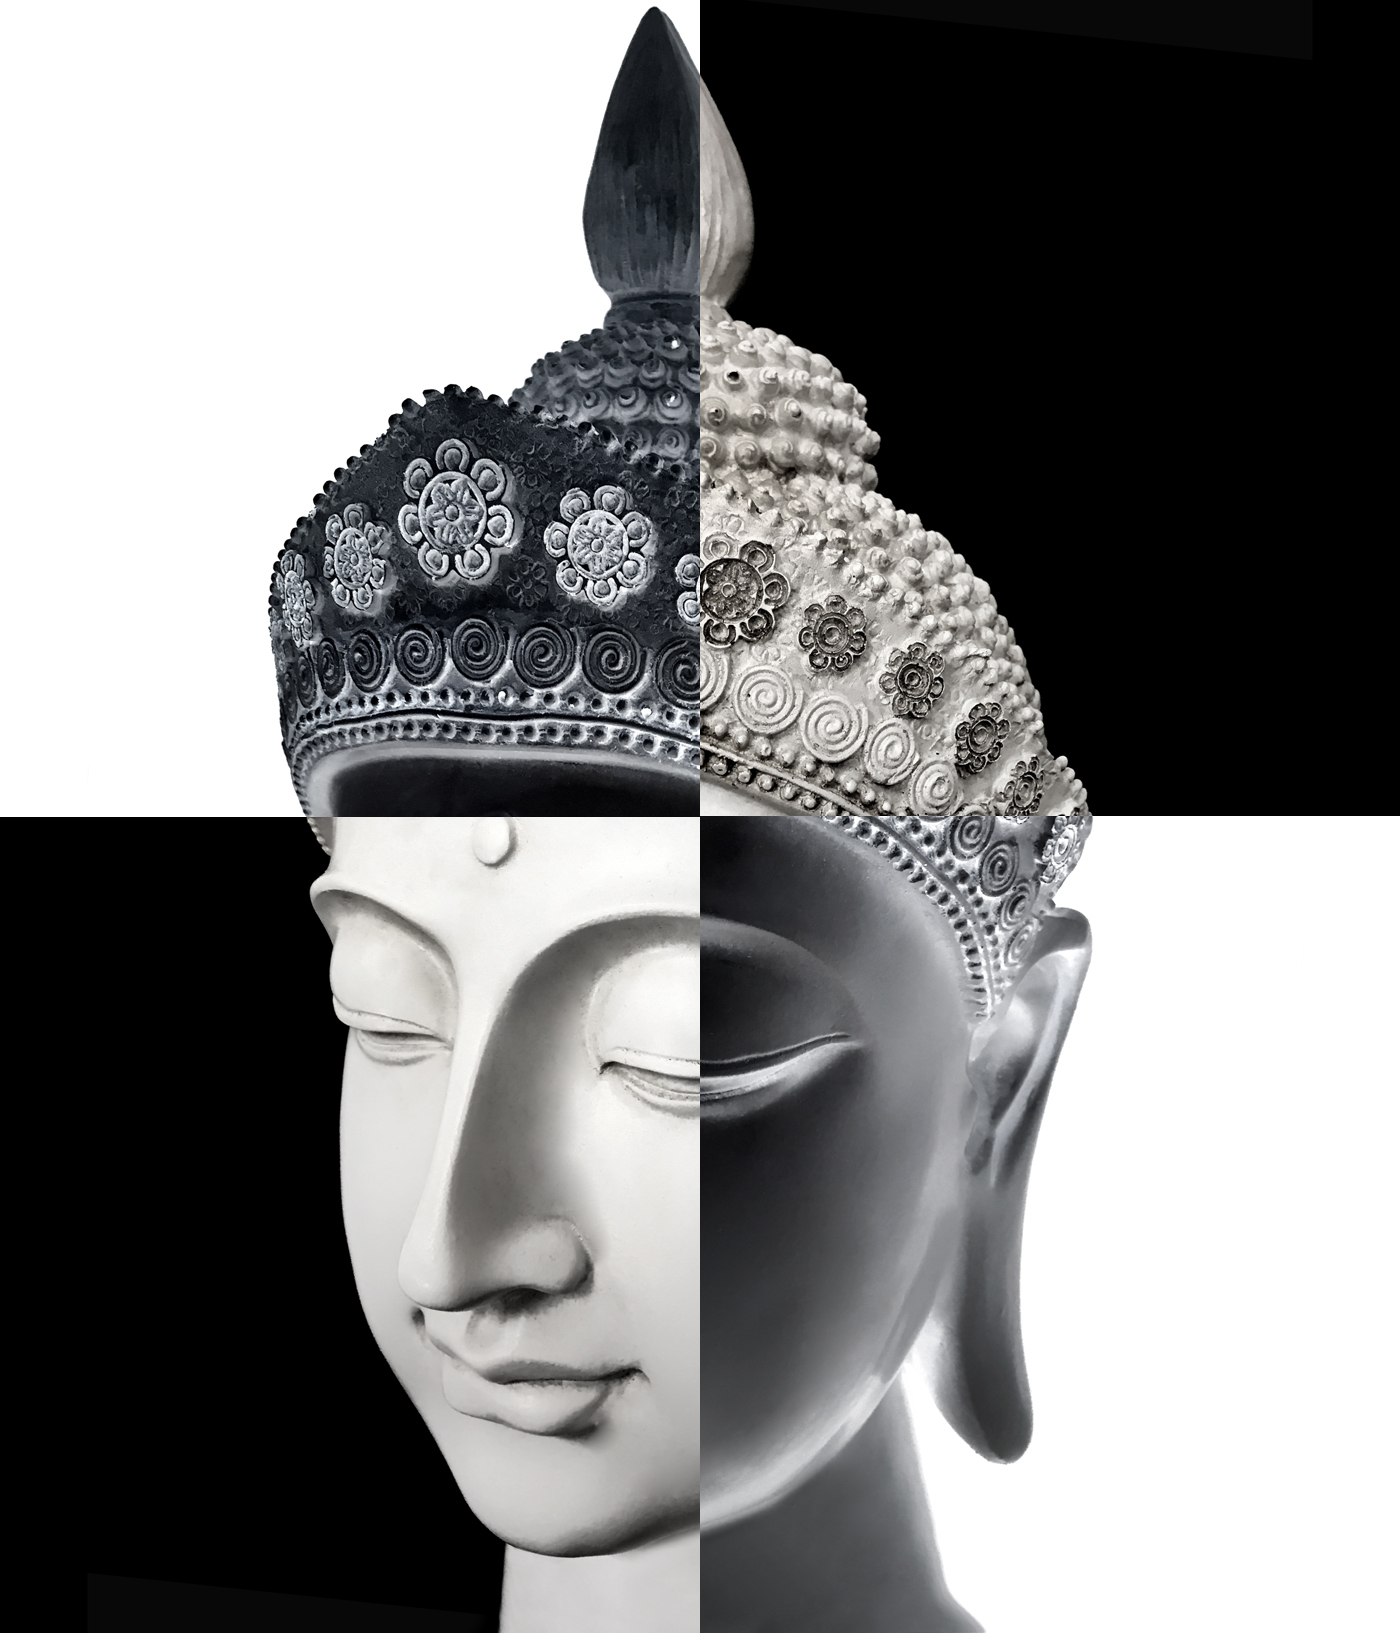 Buddha in Chaos [R] 2366